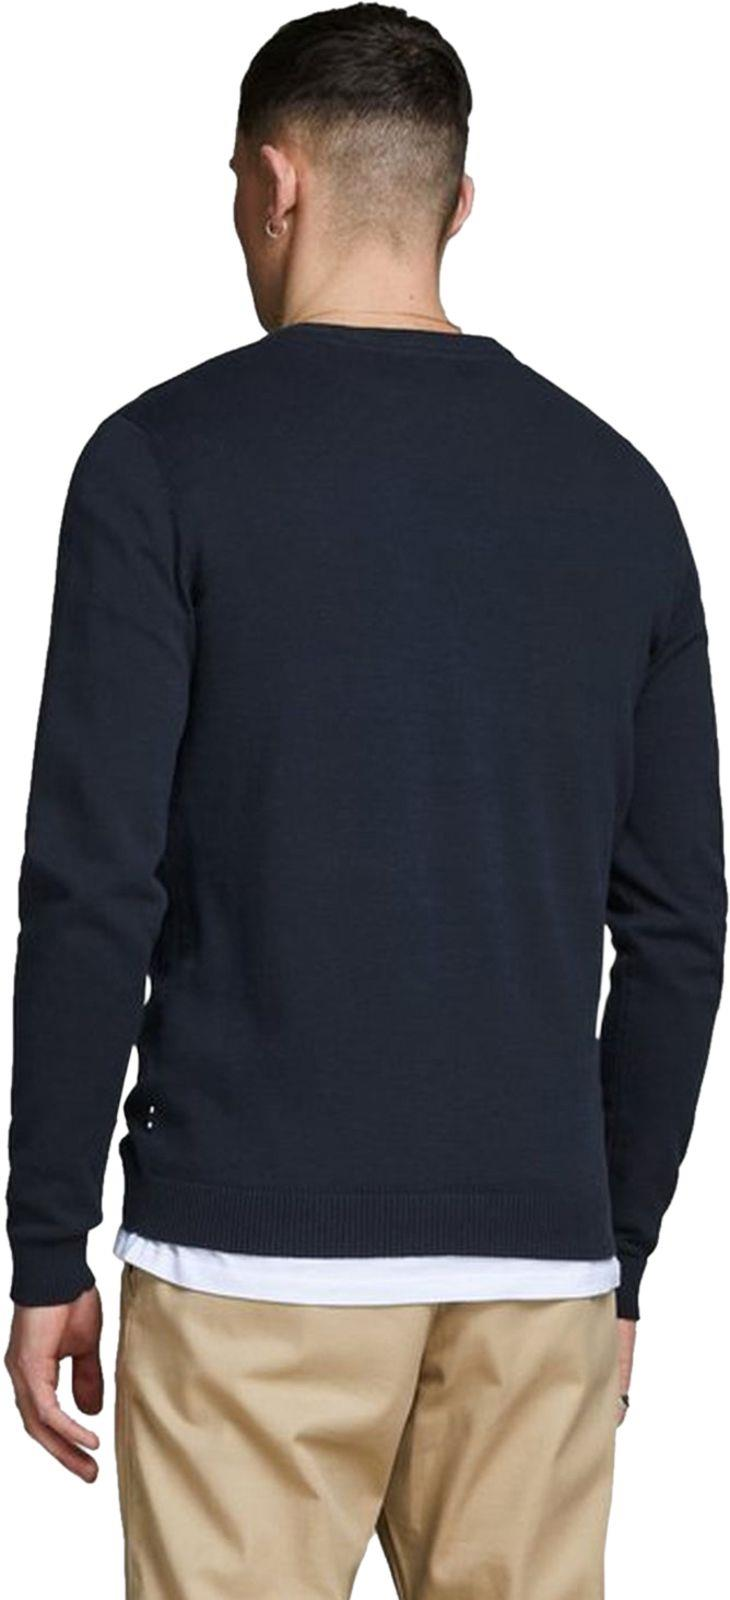 Jack-amp-Jones-Jumpers-Sweaters-Cardigans-Assorted-S-XXL miniatuur 22